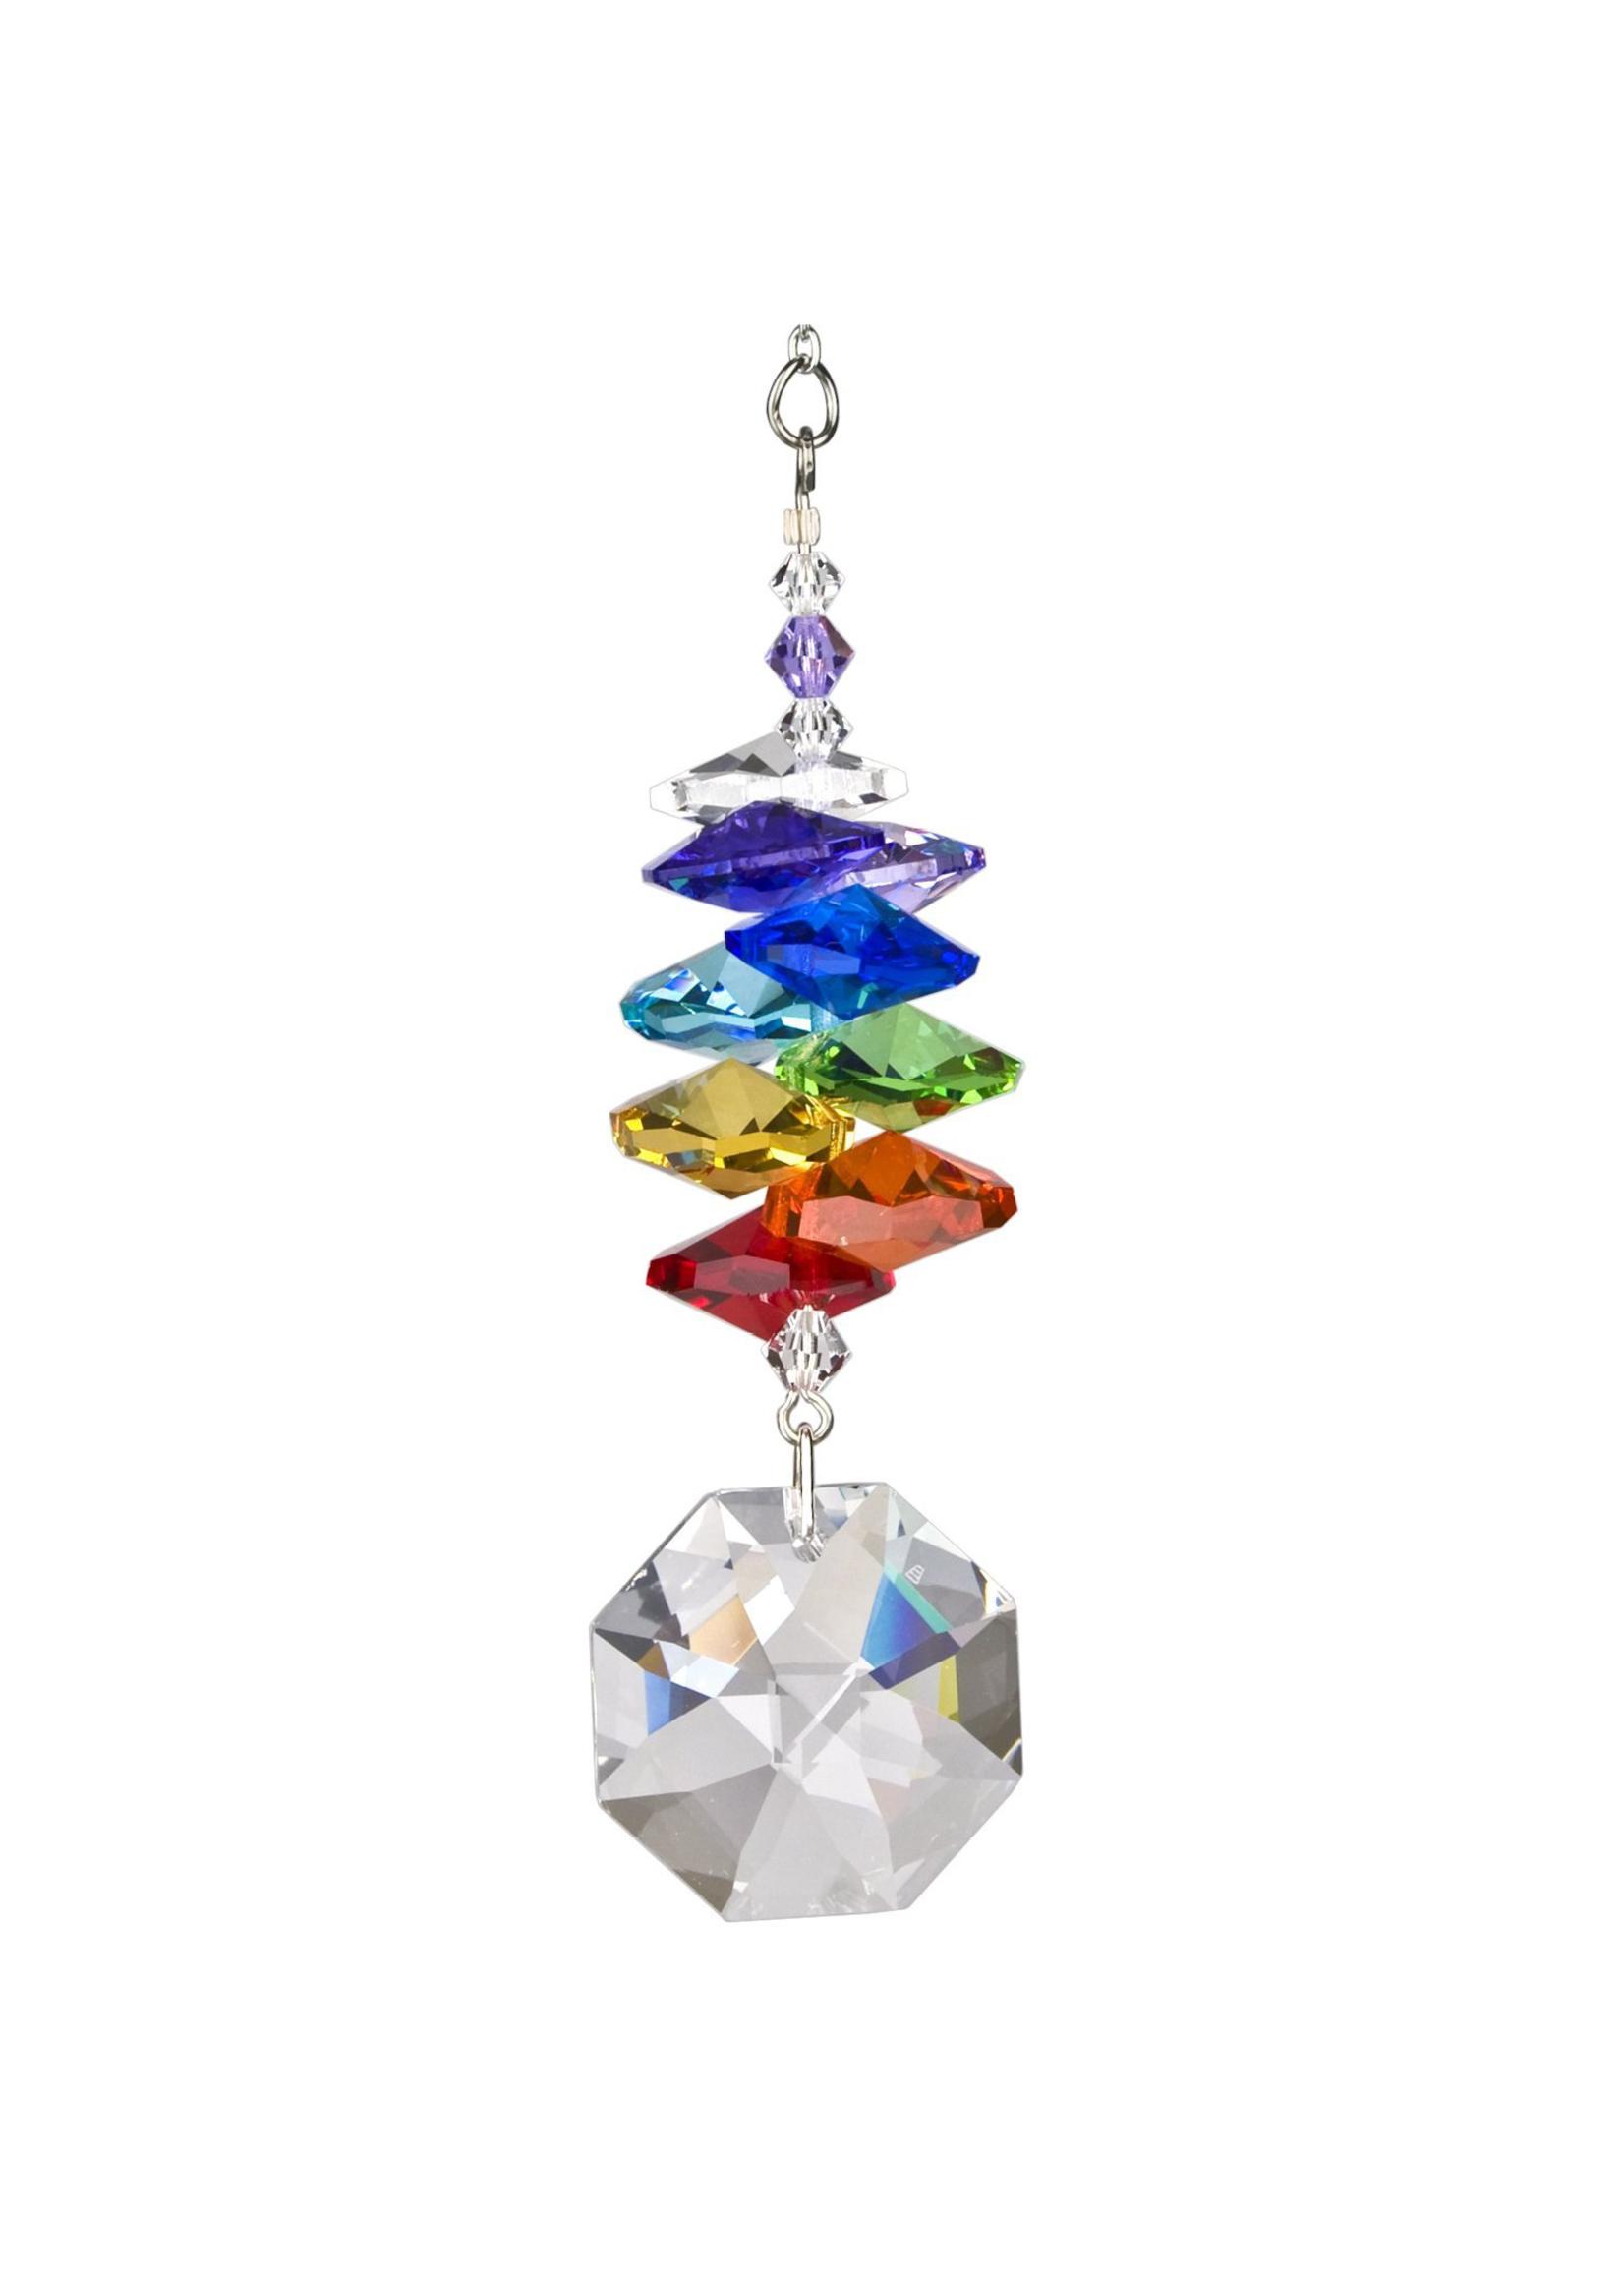 Woodstock Chimes Crystal Rainbow Cascade, Octagon